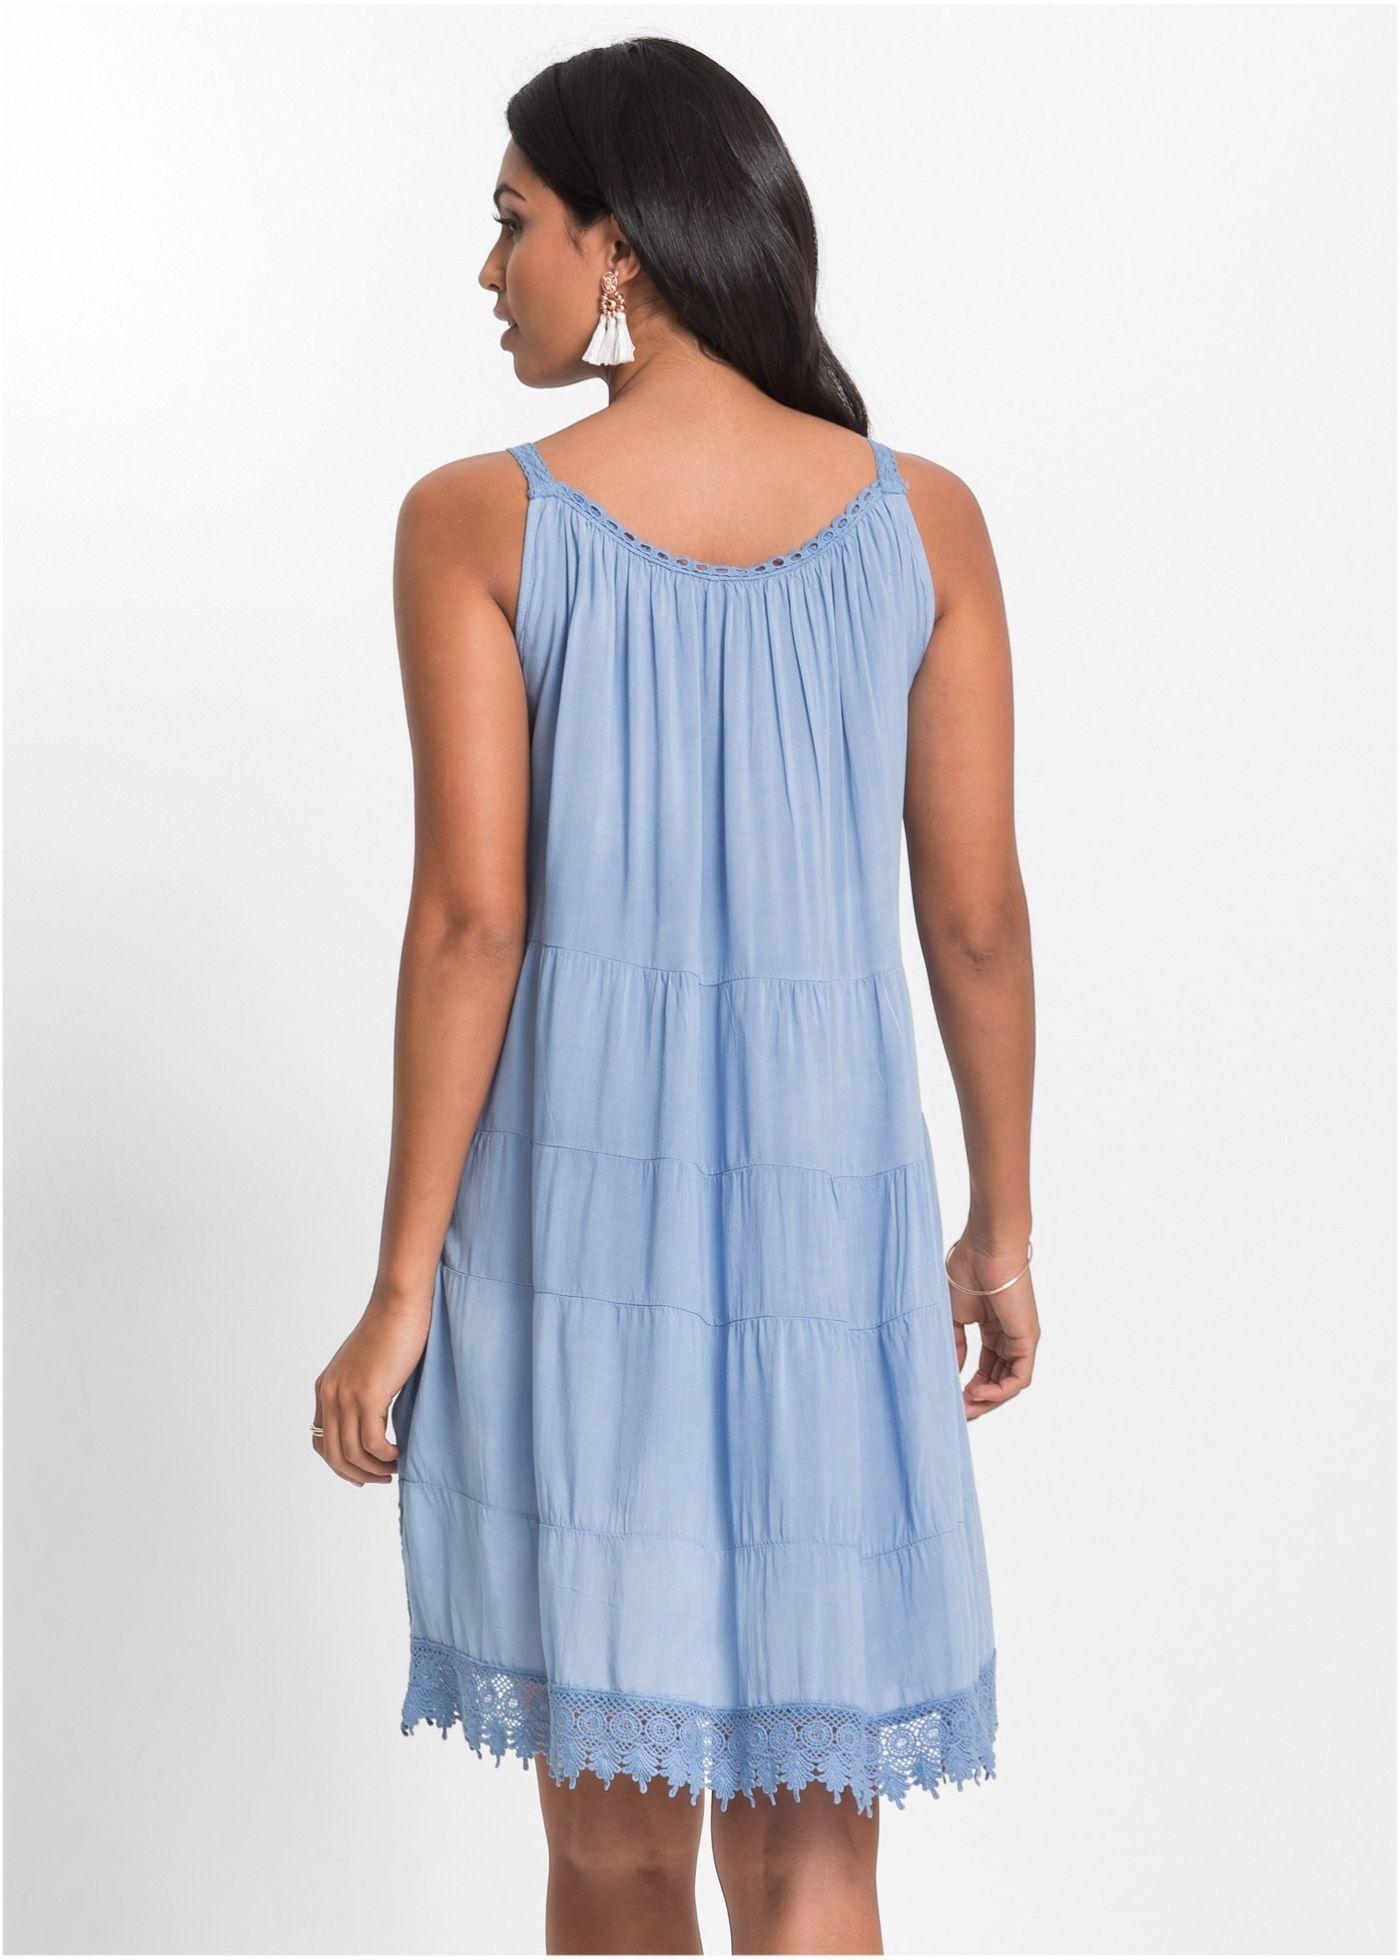 Pin By Petra Lindlar On Krasivaya Odezhda Platya I Drugoe Dresses Summer Dresses Fashion